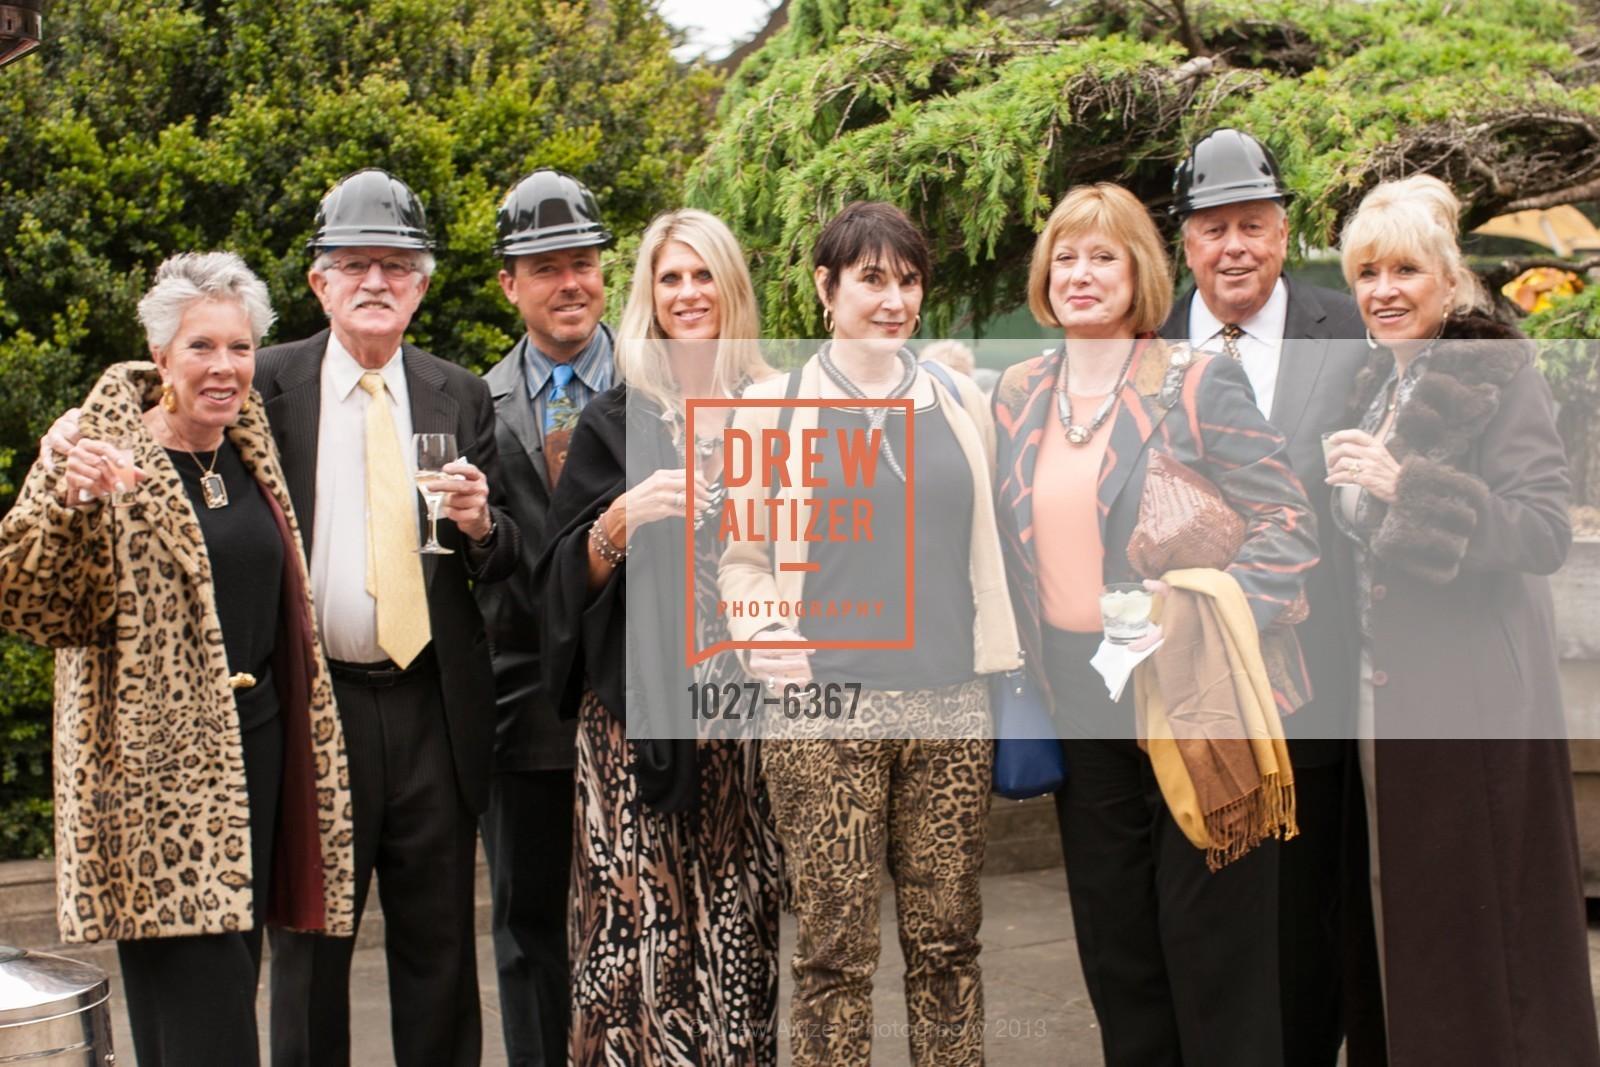 Lori Sebastian, Susan Beech, Kathleen Maher, ZooFest 2013 Hard Hat & Tails, US, May 11th, 2013